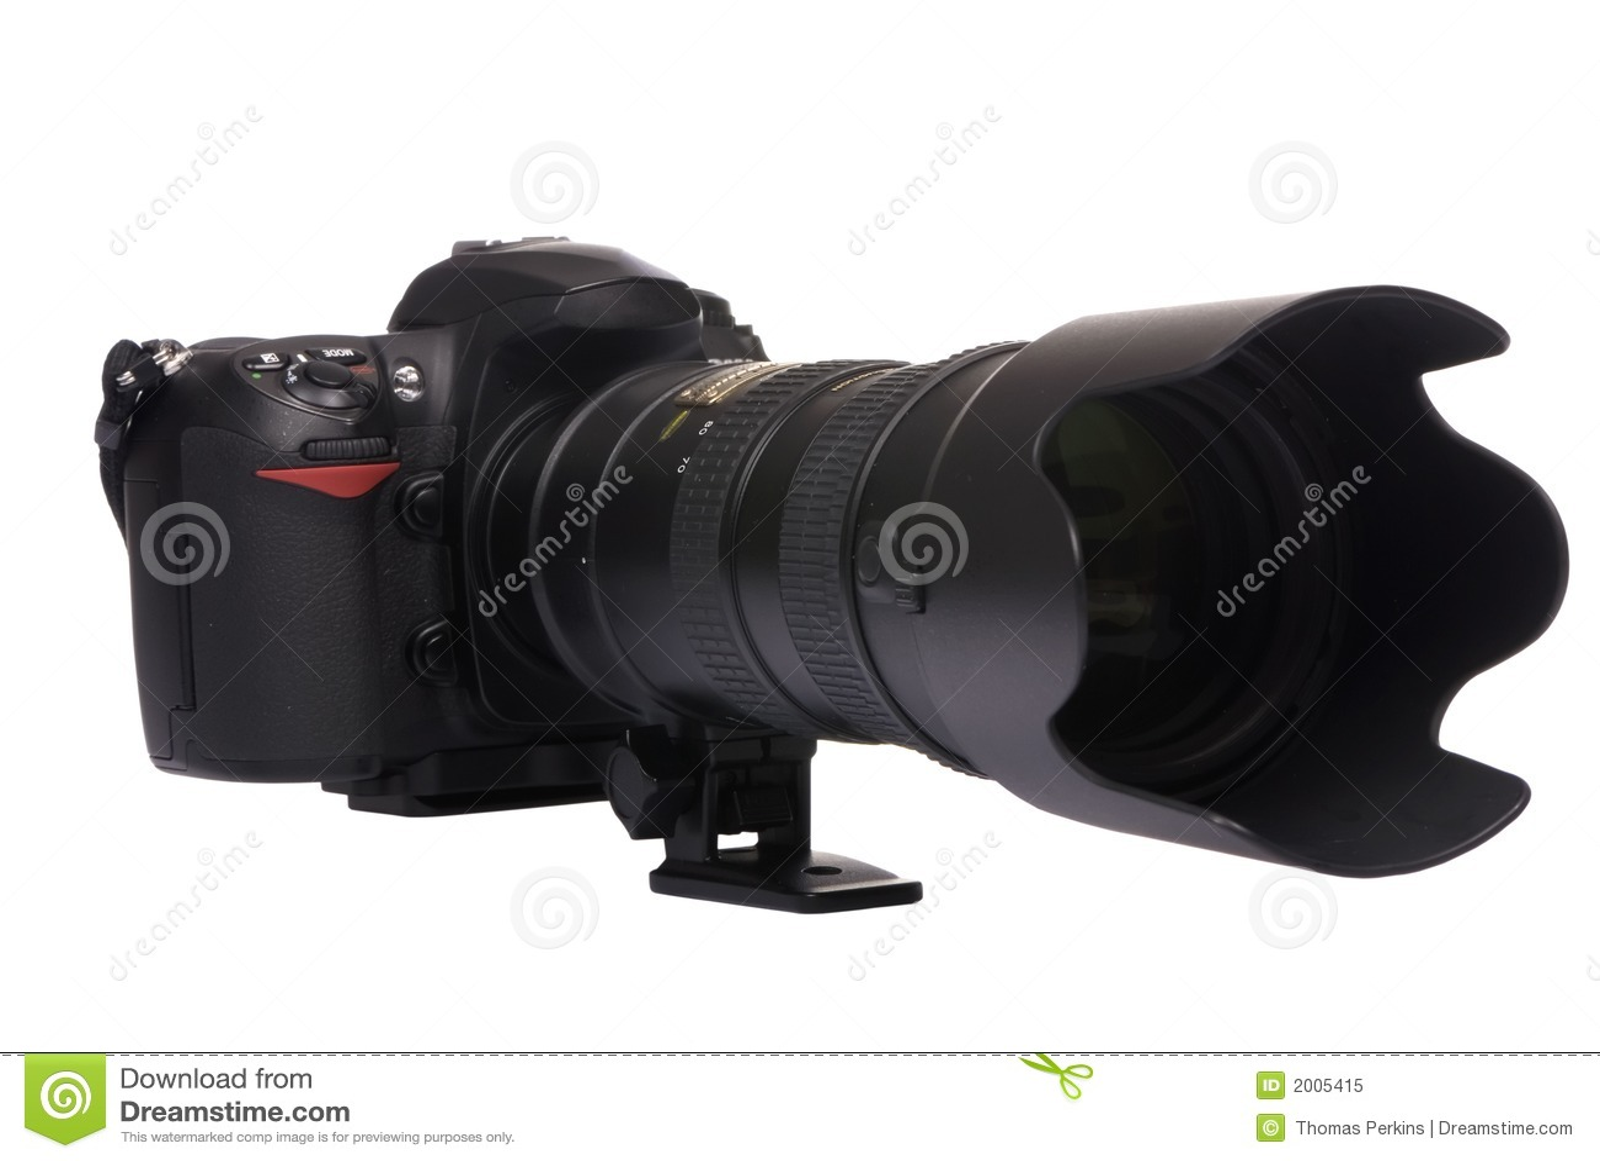 Digitalkamera DSLR (großes Glas)